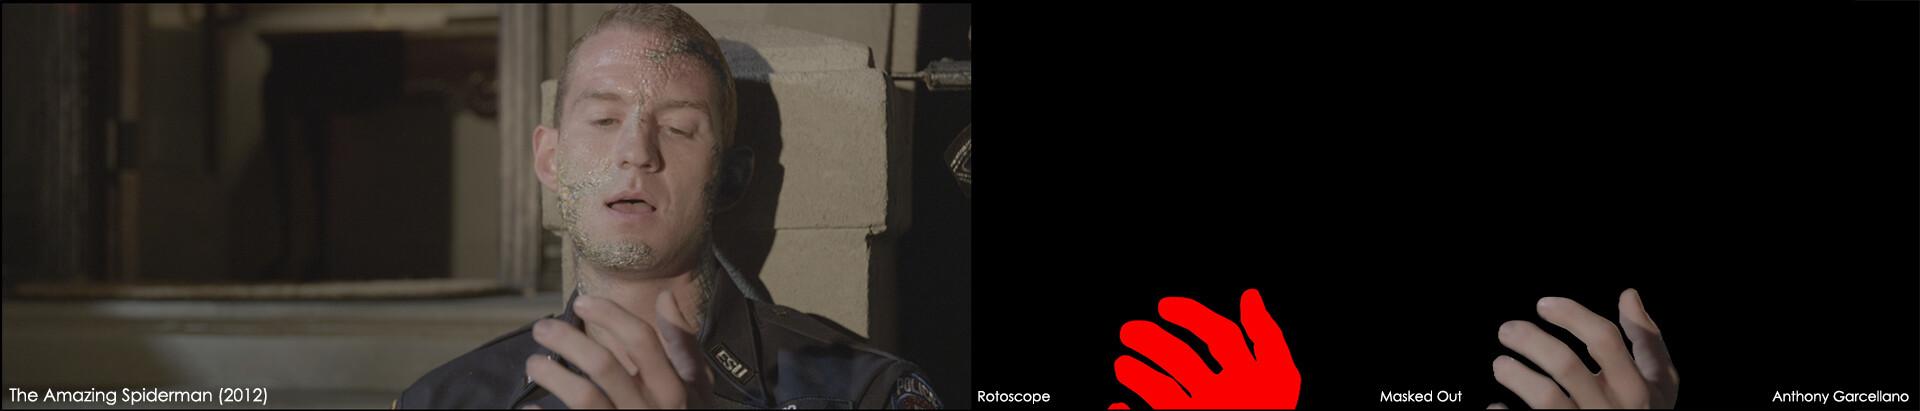 Anthony garcellano theamazingspiderman rotoscope 02 anthonygarcellano